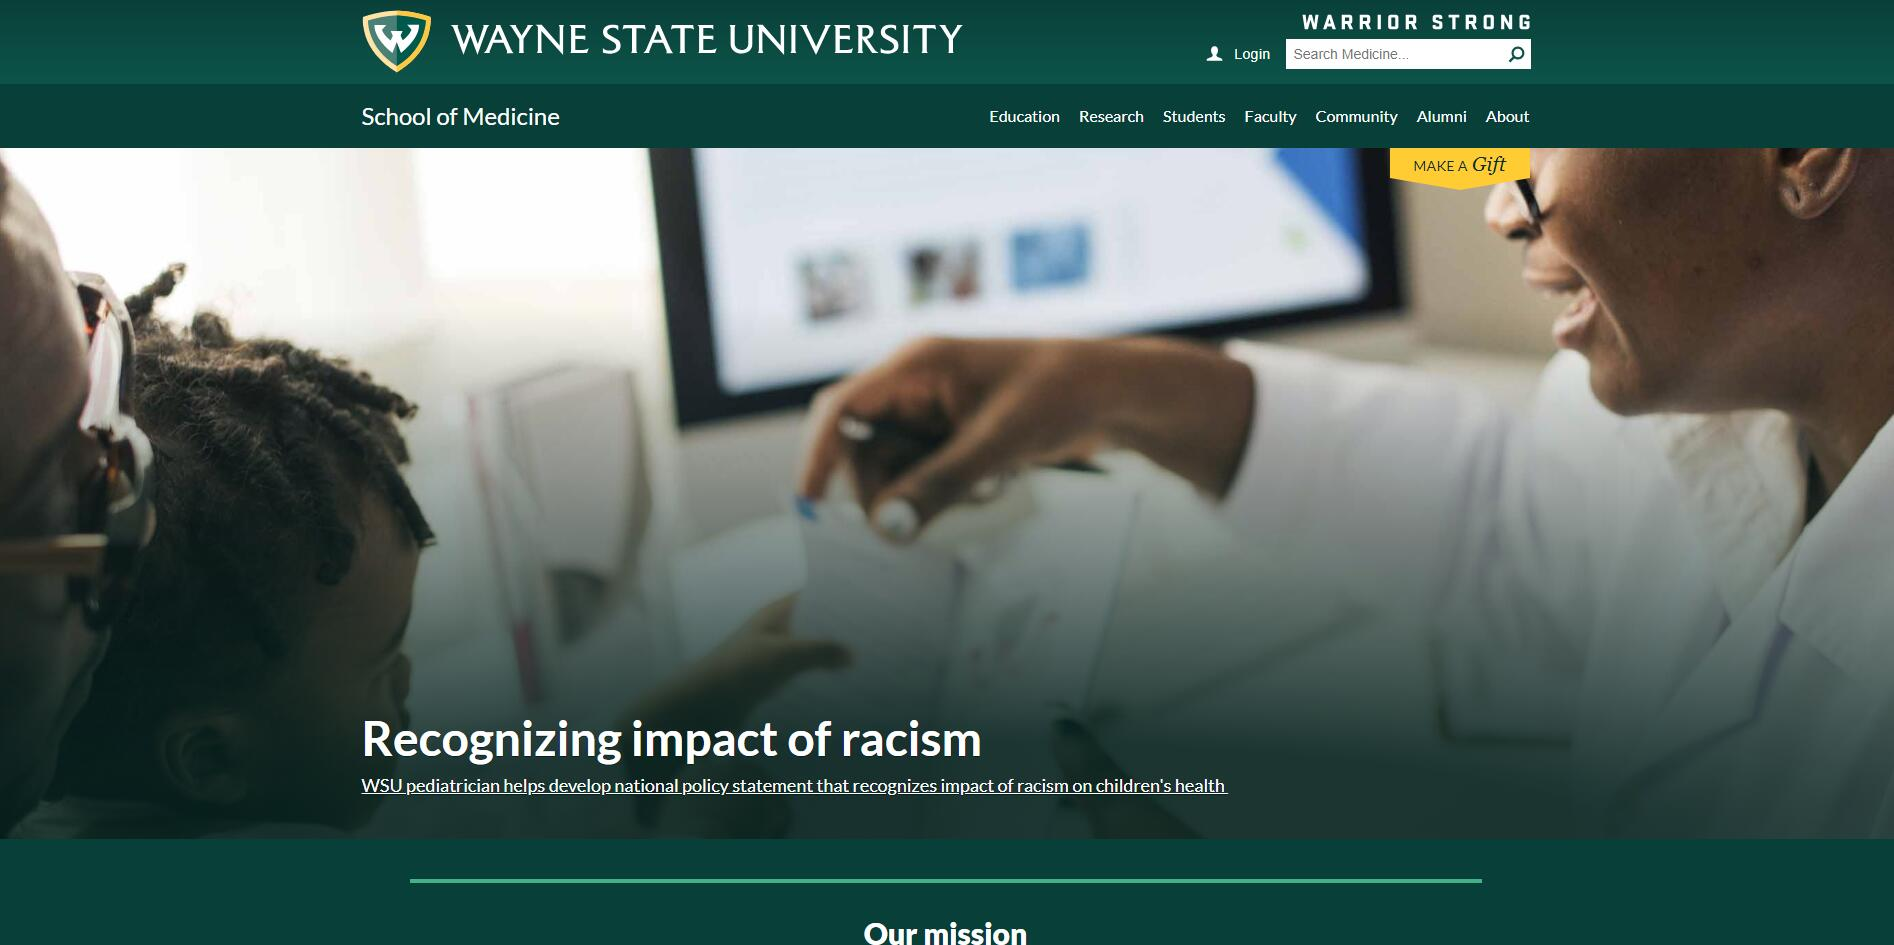 The School of Medicine at Wayne State University